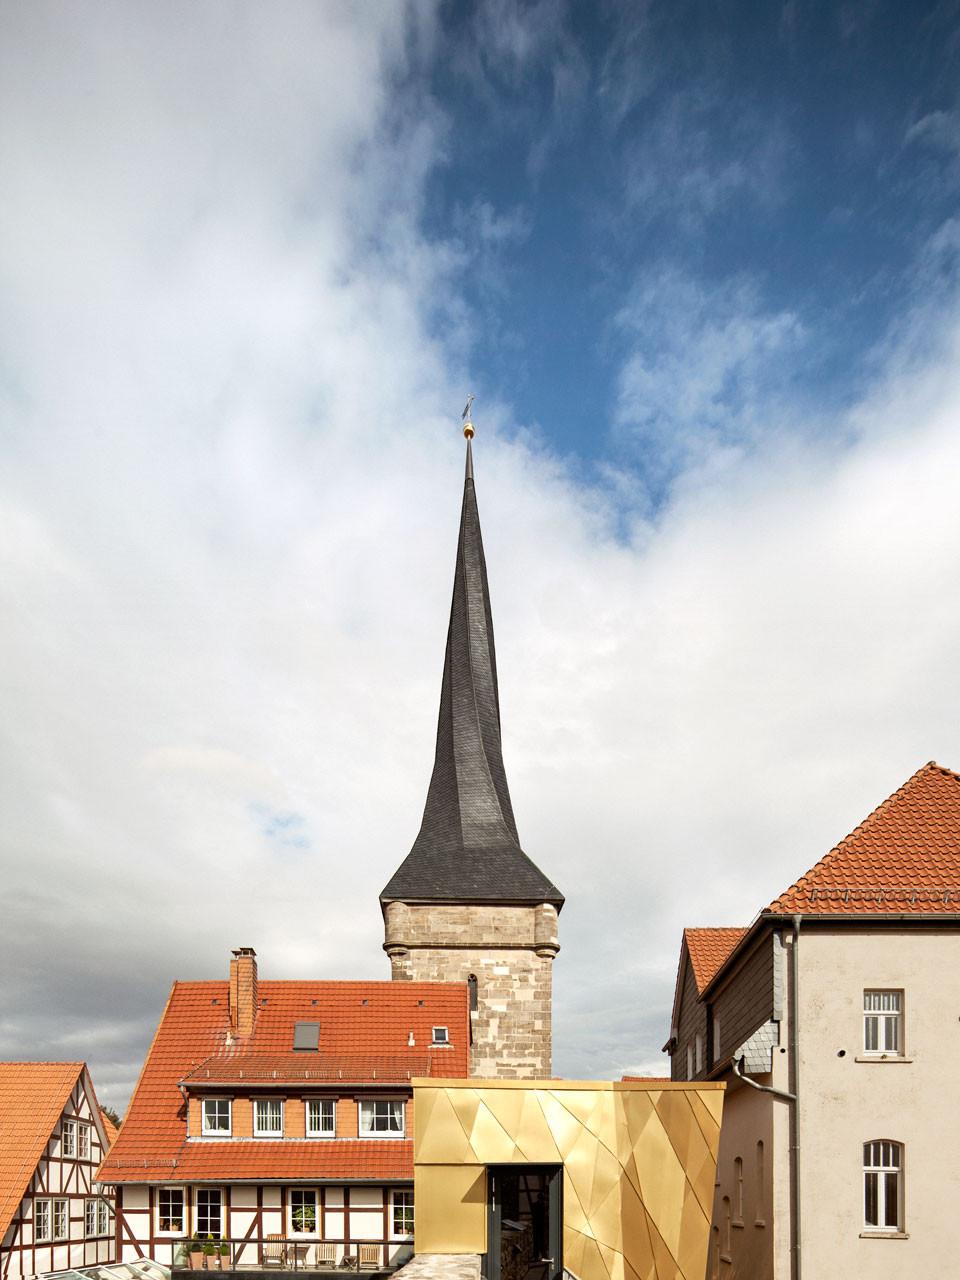 Timo_Stammberger_Duderstadt_Rathaus_Sommer_Tourismus_02